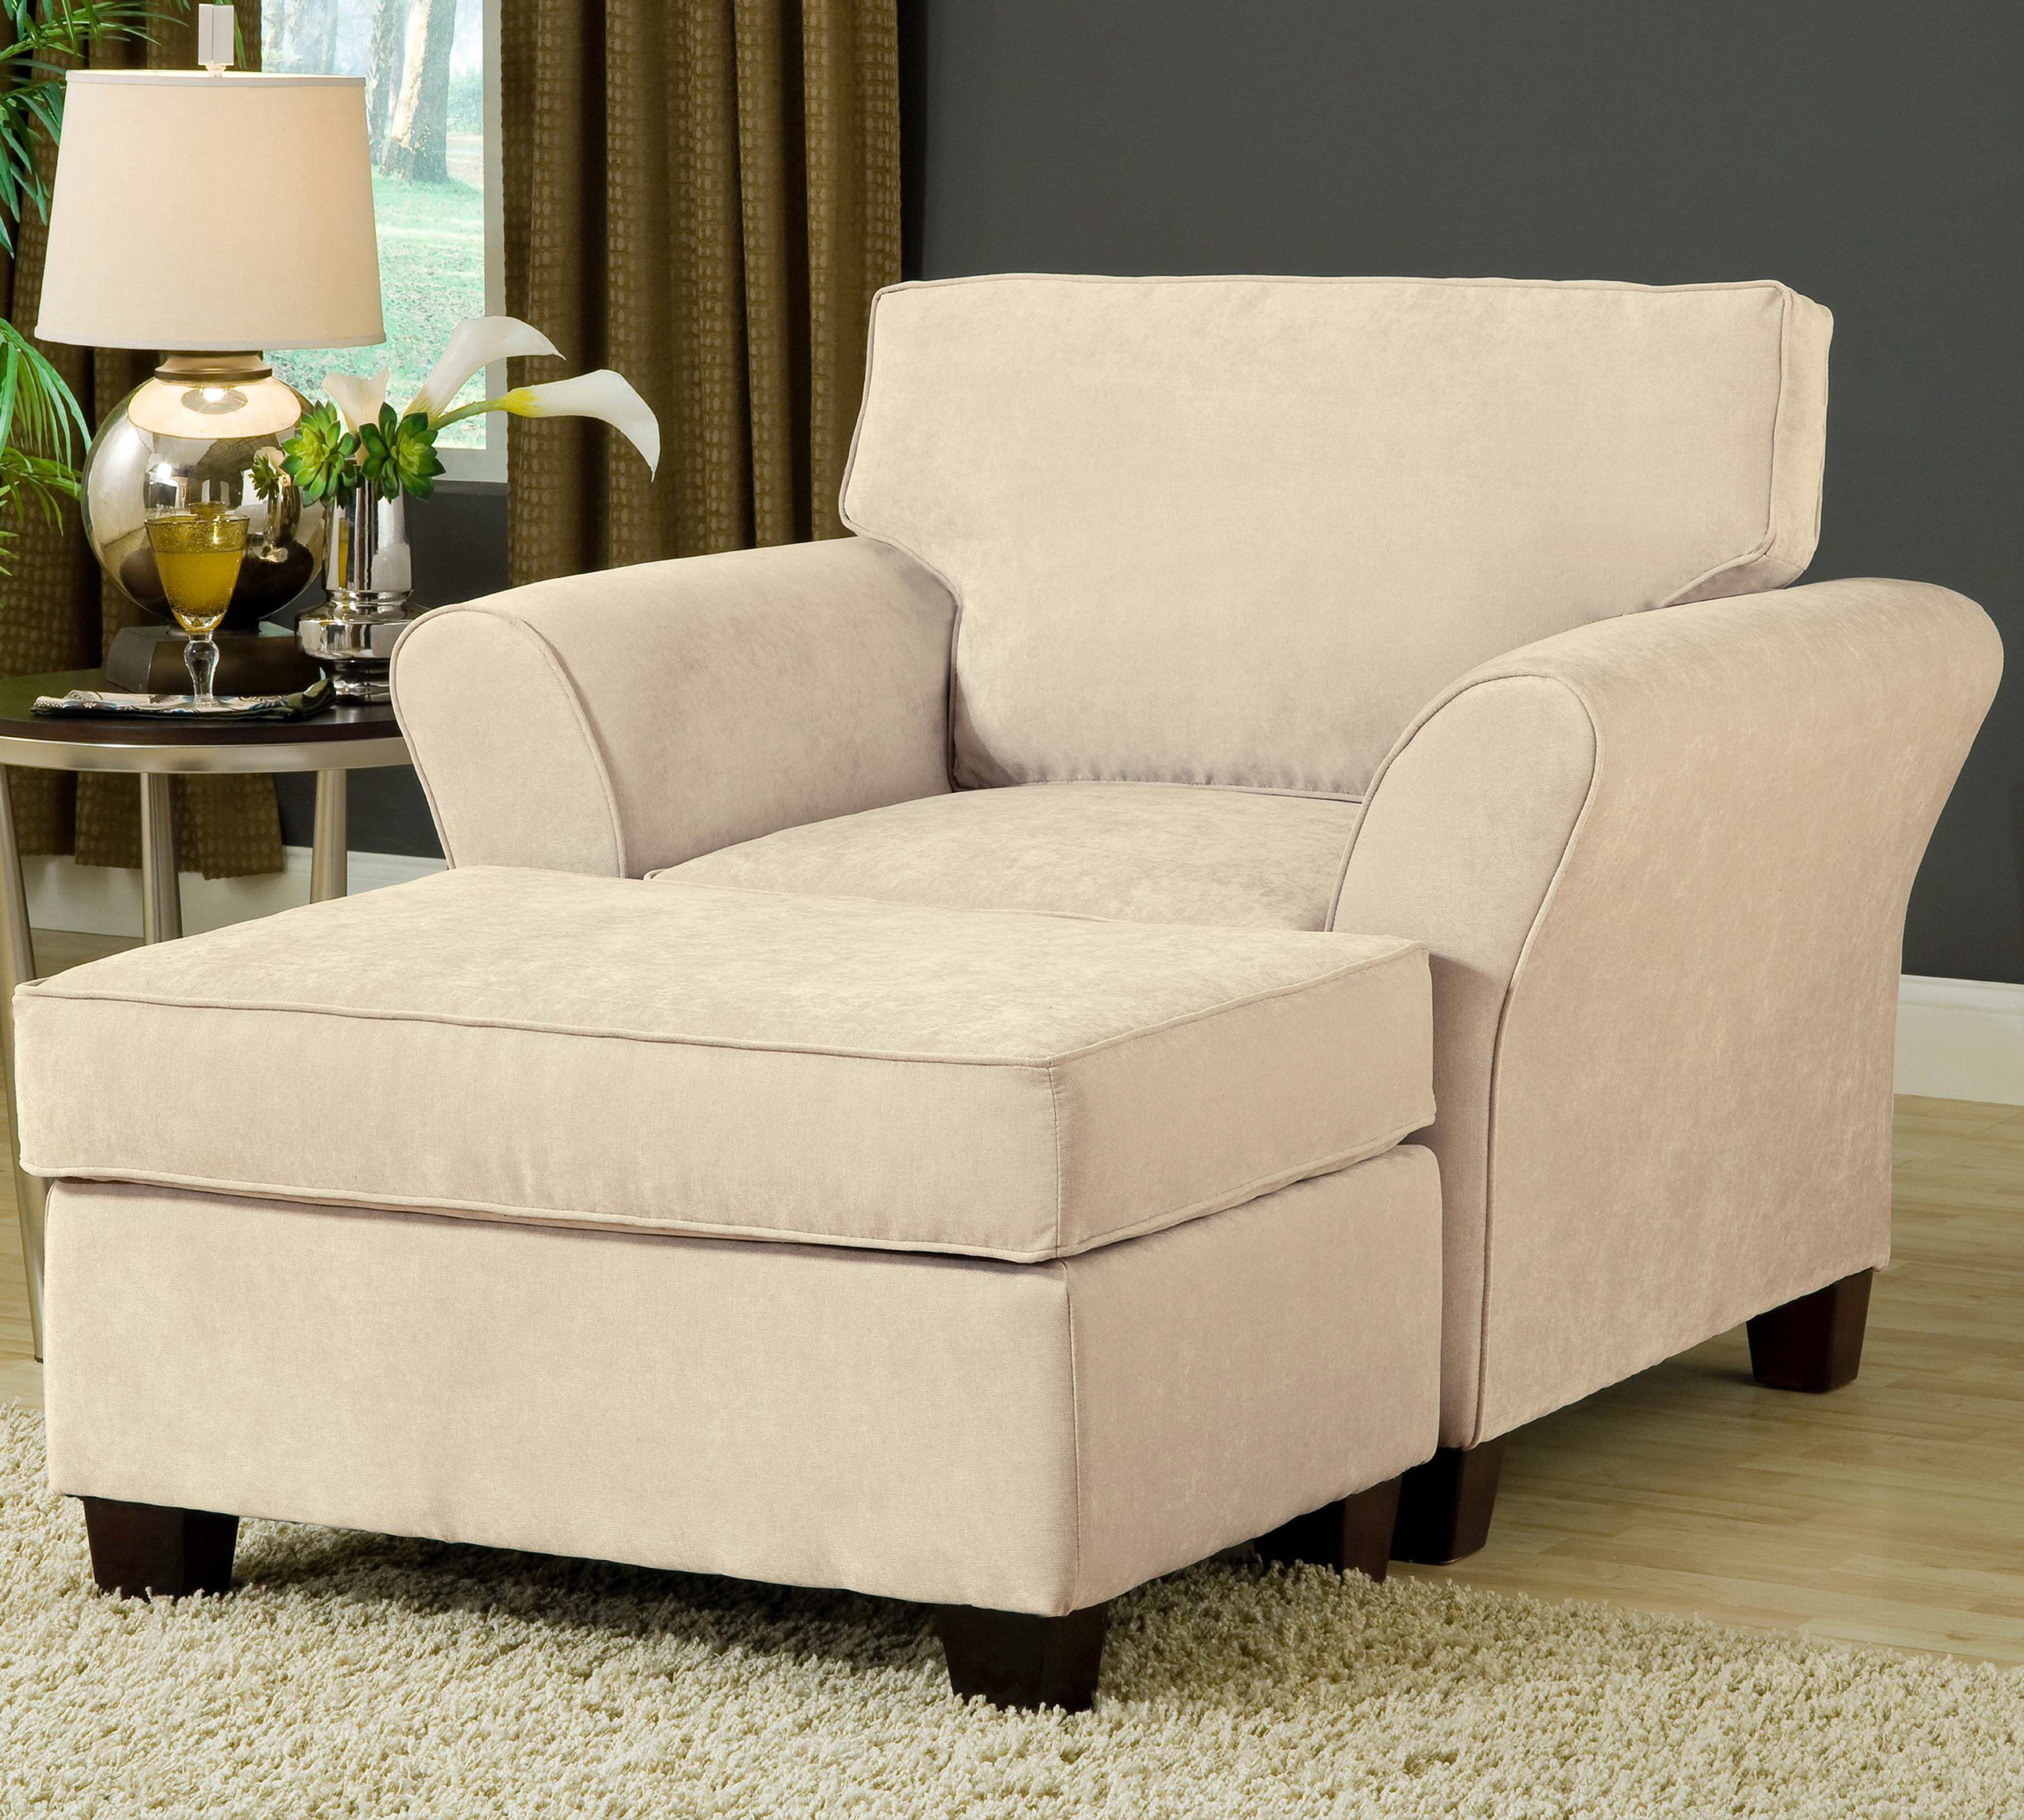 Addison 8400 Chair and Ottoman by VFM Essentials at Virginia Furniture Market